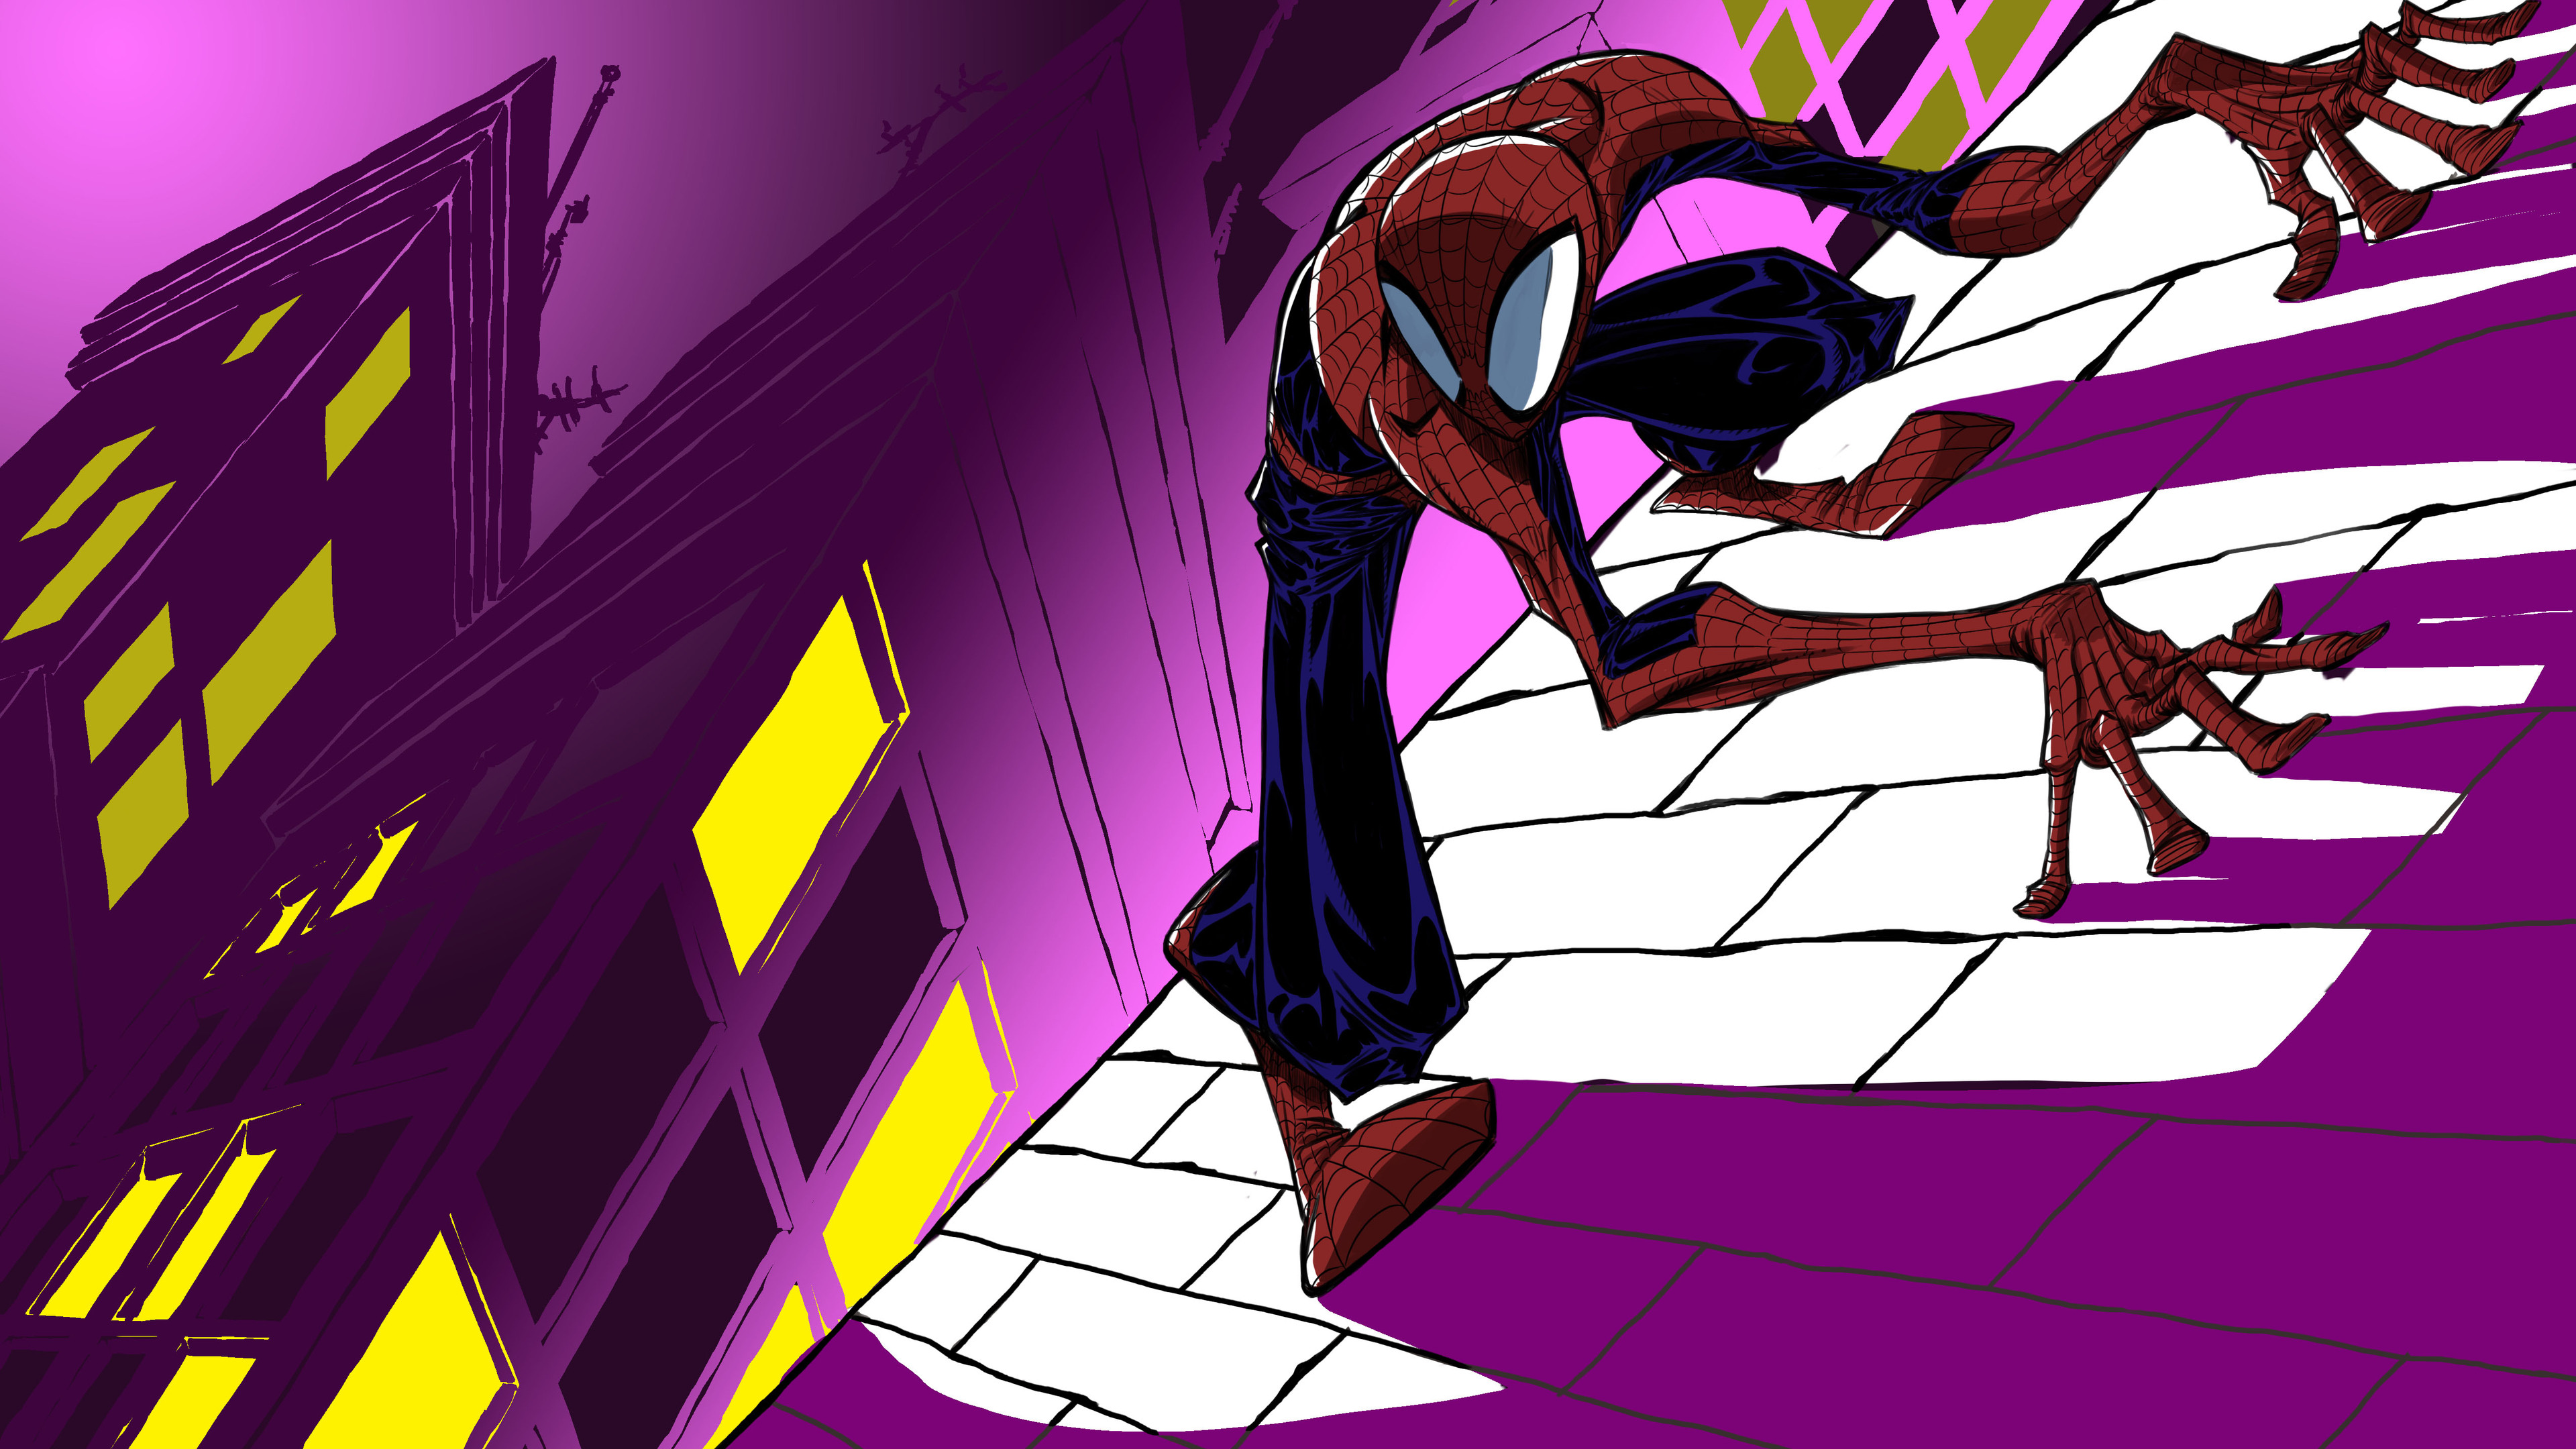 5k-spiderman-art-nh.jpg